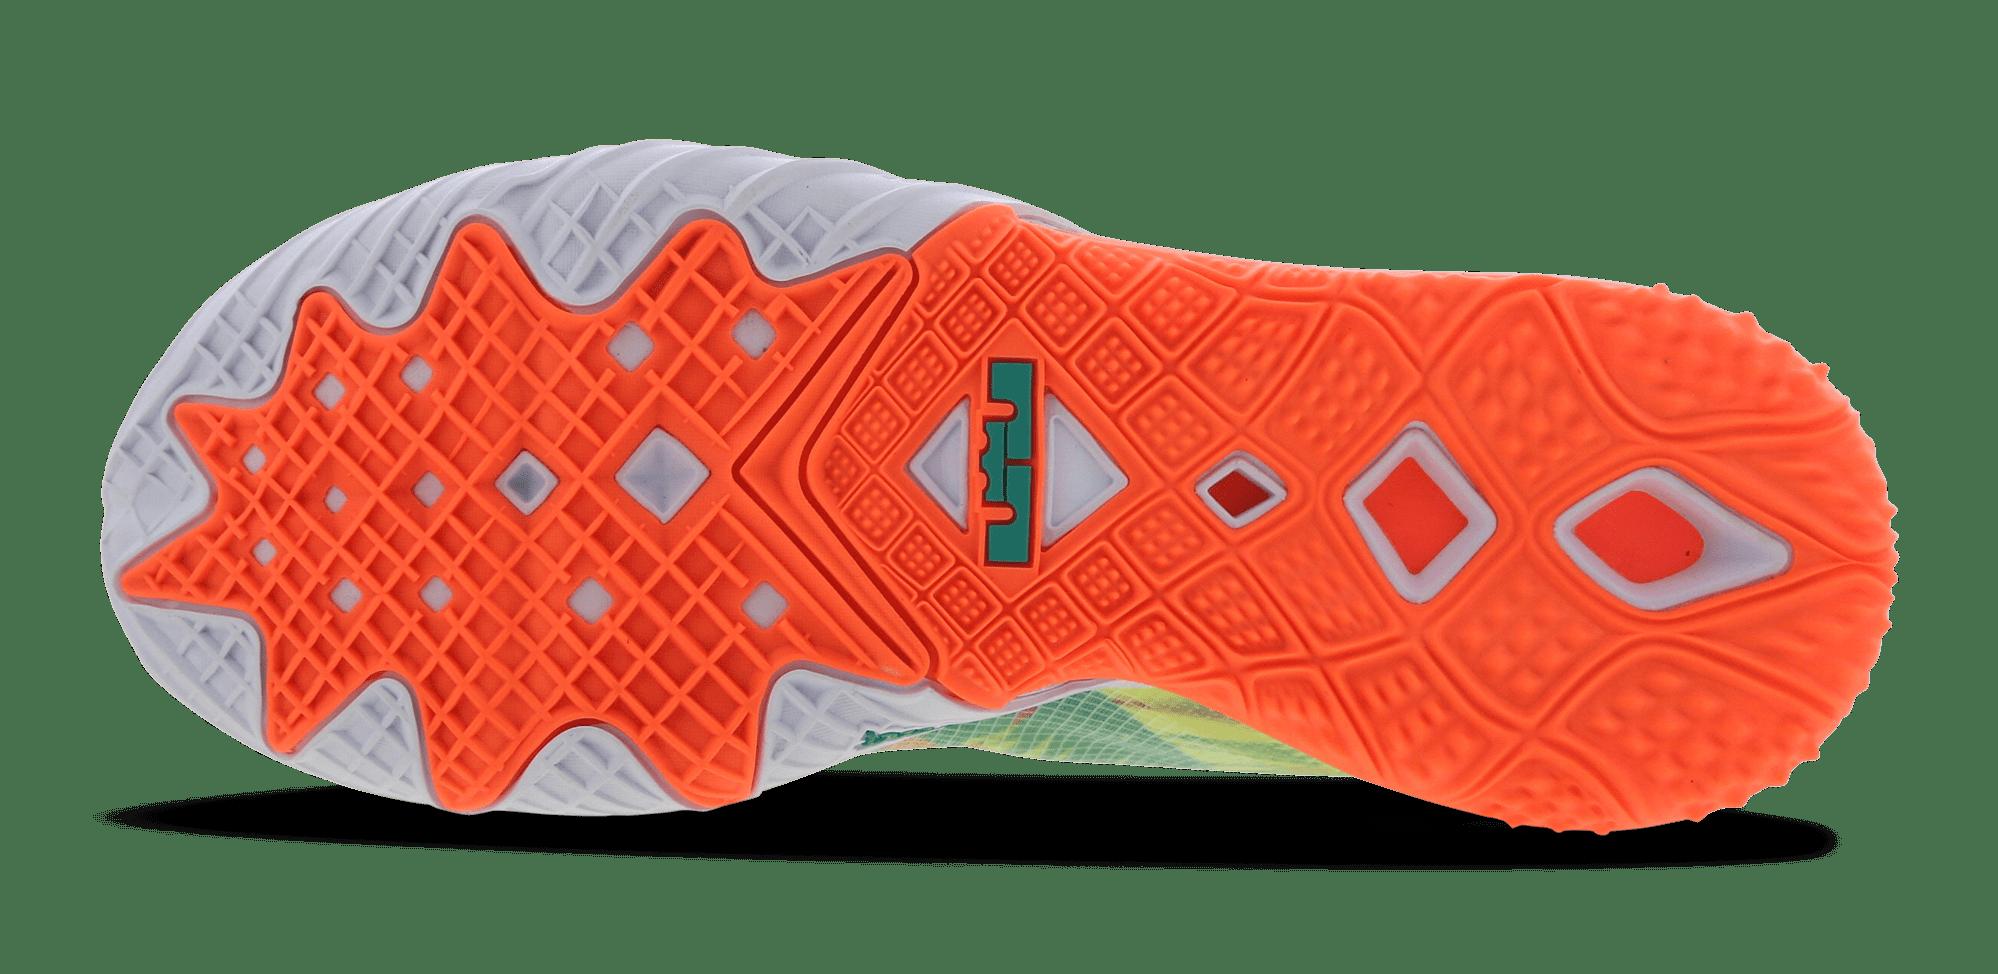 Nike LeBron 18 Low 'LeBronald Palmer' CV7562-300 Outsole